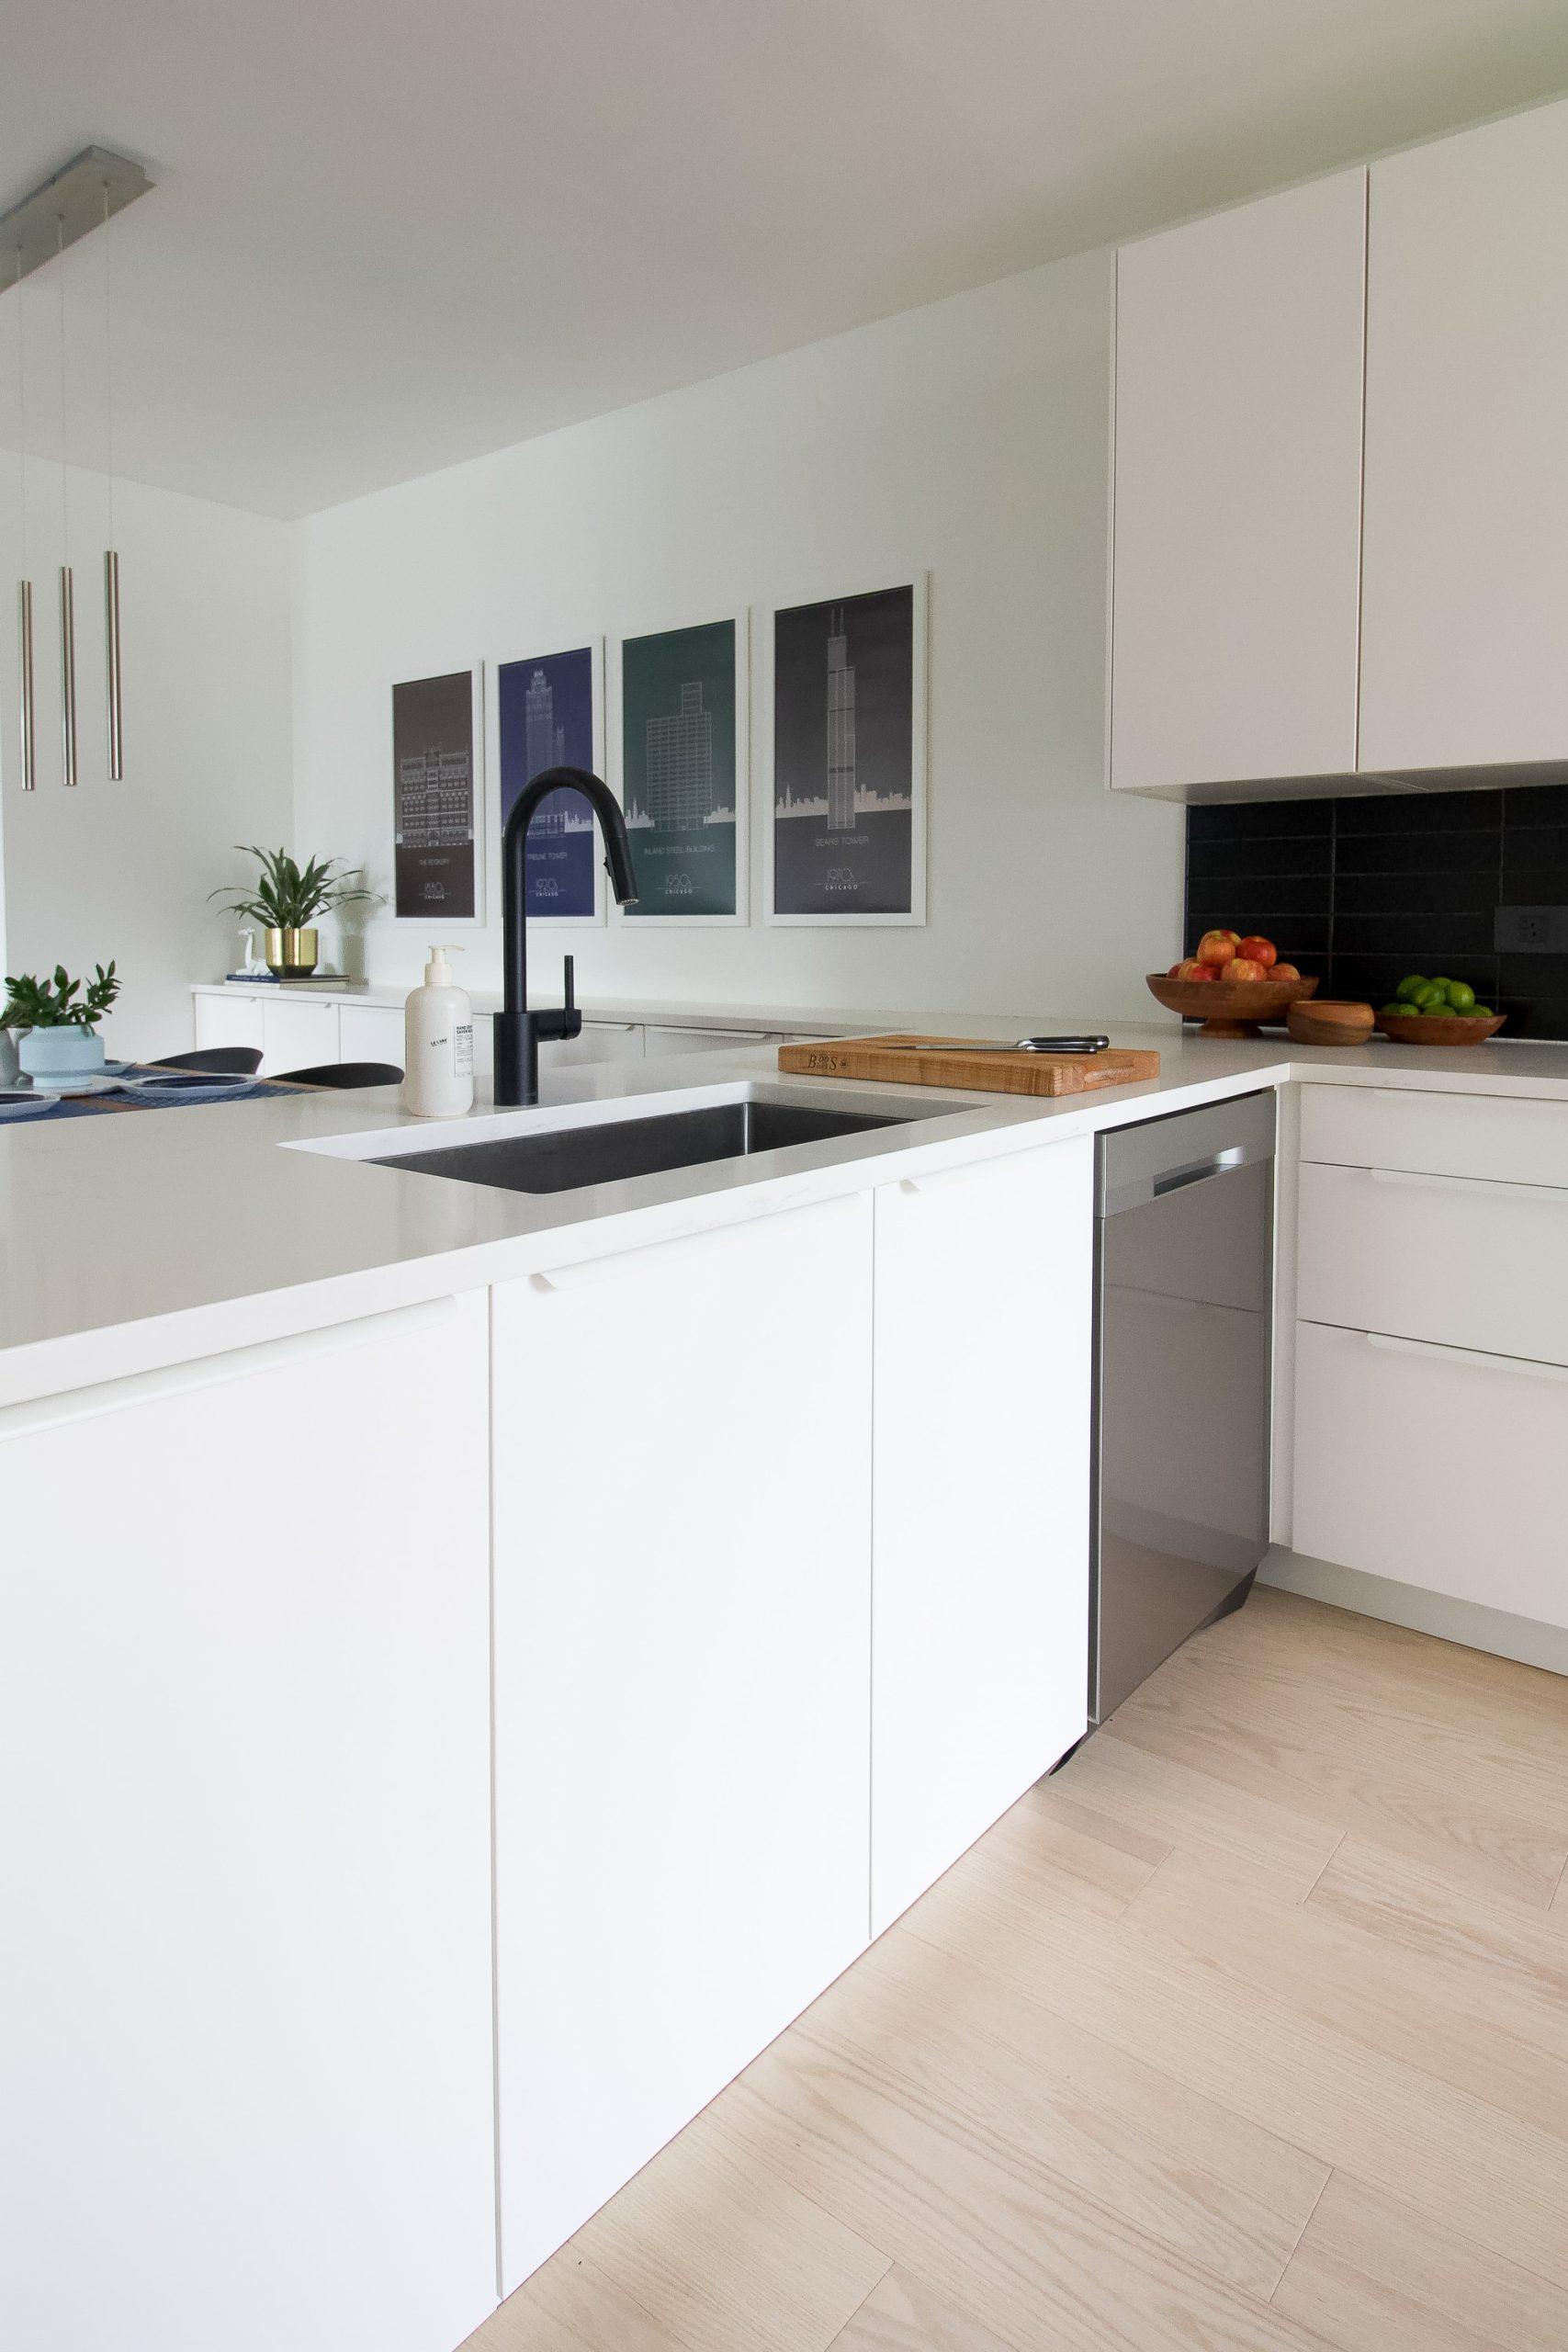 White sleek cabinets